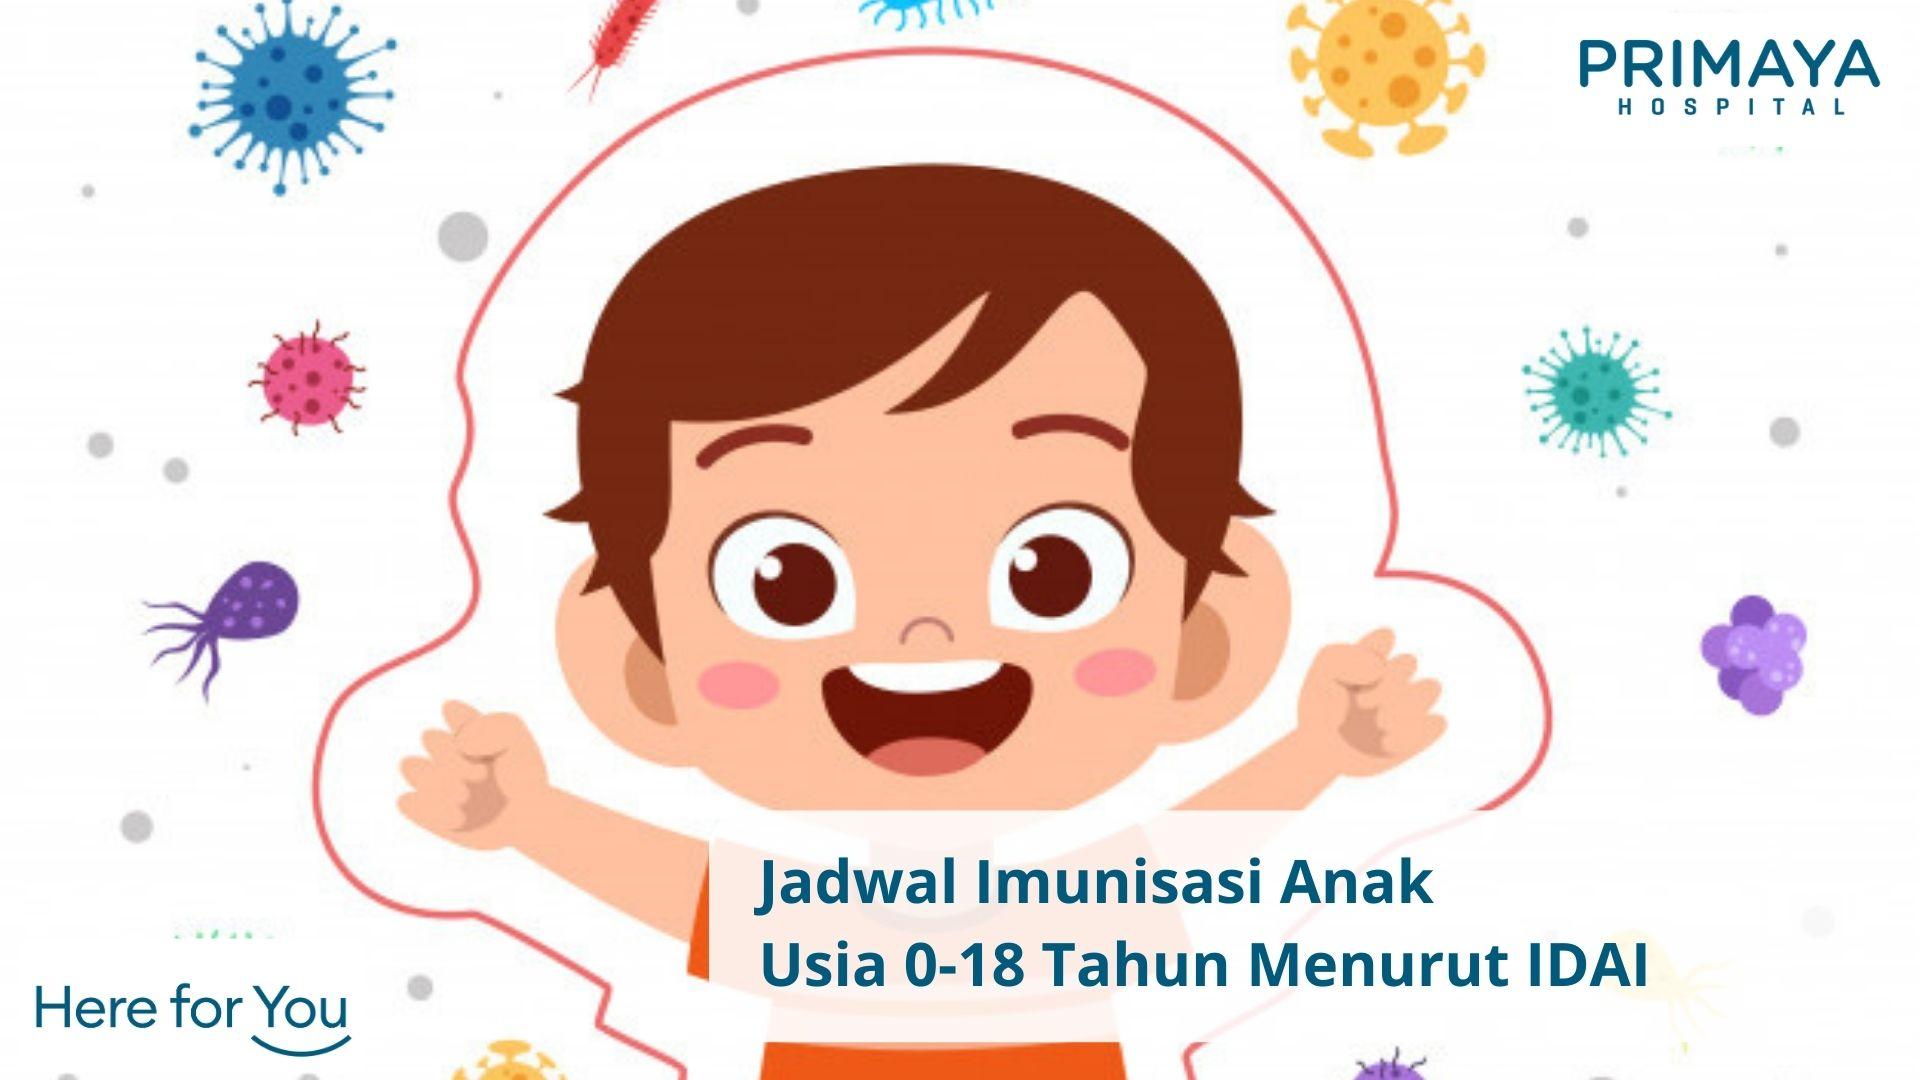 Jadwal Imunisasi Anak Usia 0-18 Tahun Menurut IDAI